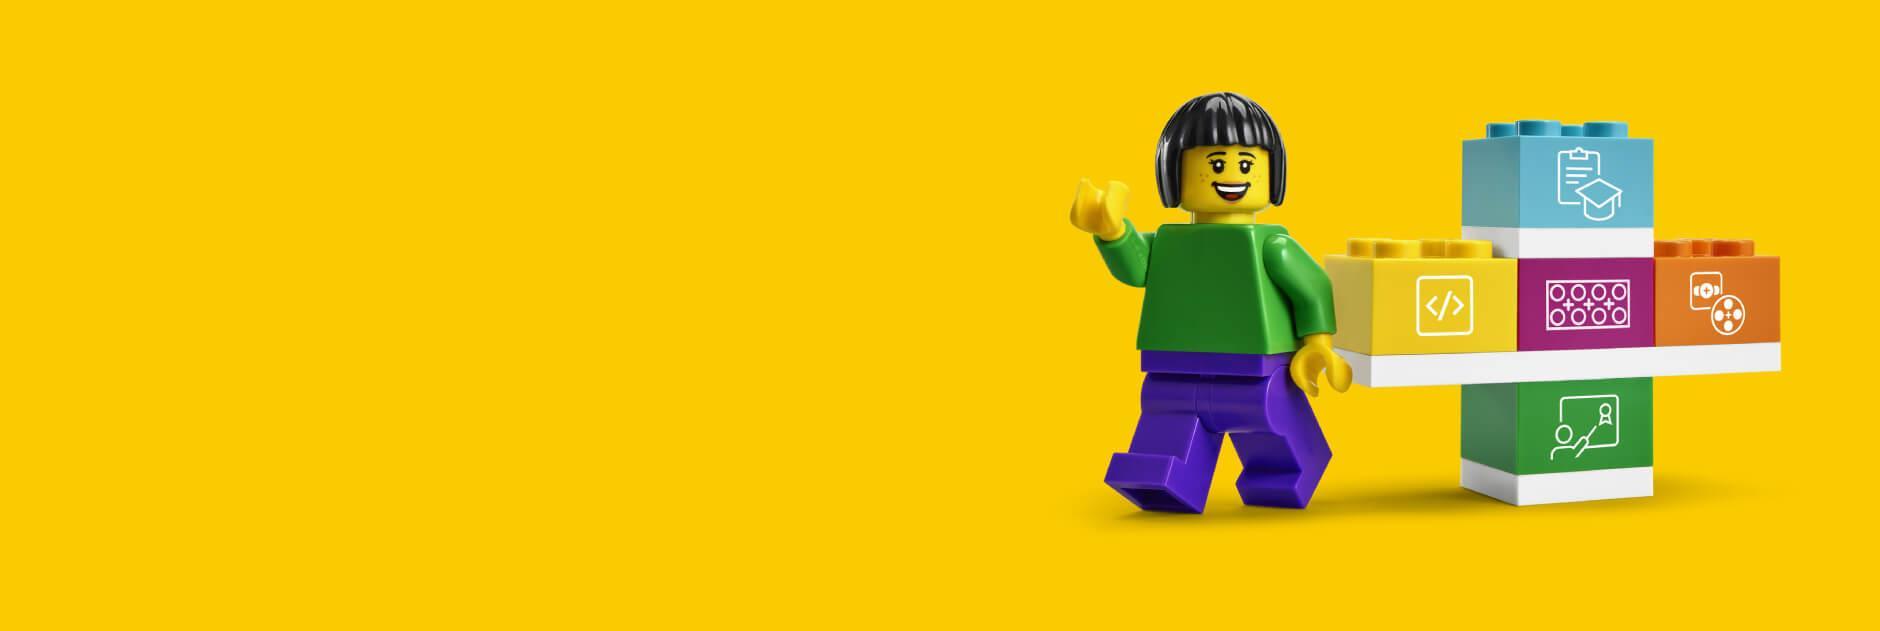 LEGO Learning System